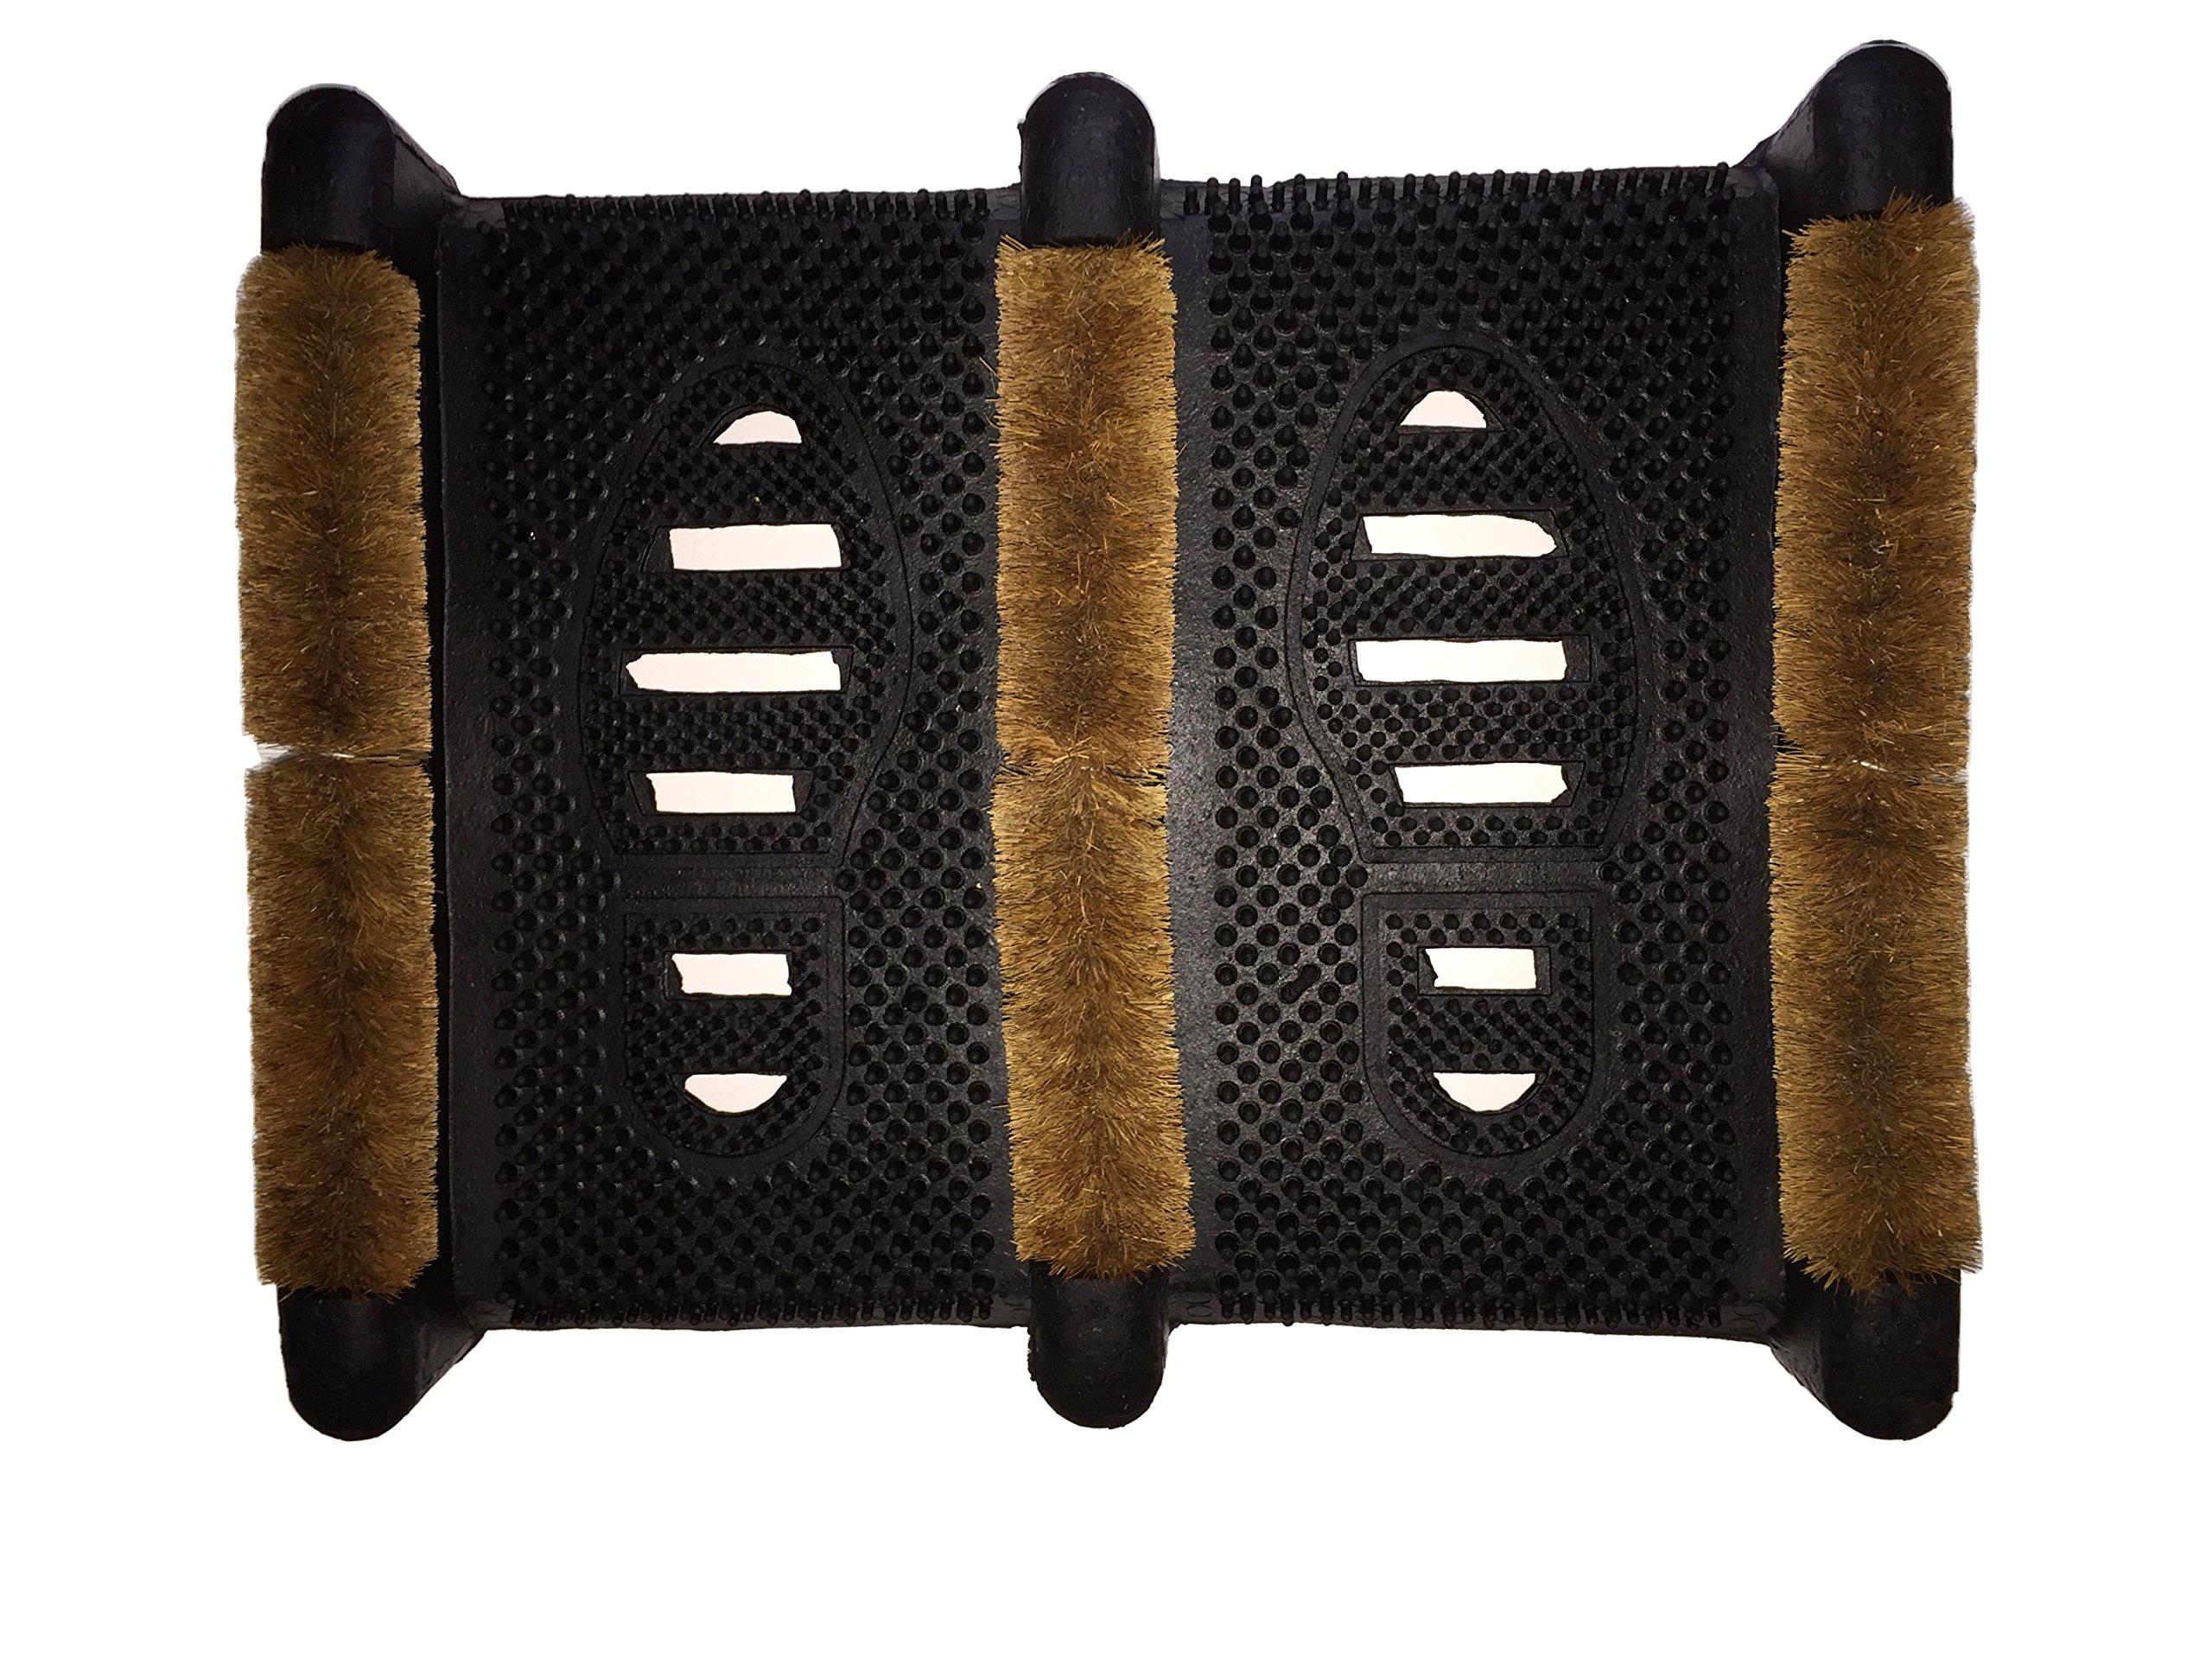 La Deins Rubco Boot Wiper DFG138P Boot Scraper 15.5'' X 12'' X 2.5'' Rubber Boot Scraper with Coir Fiber by La Deins